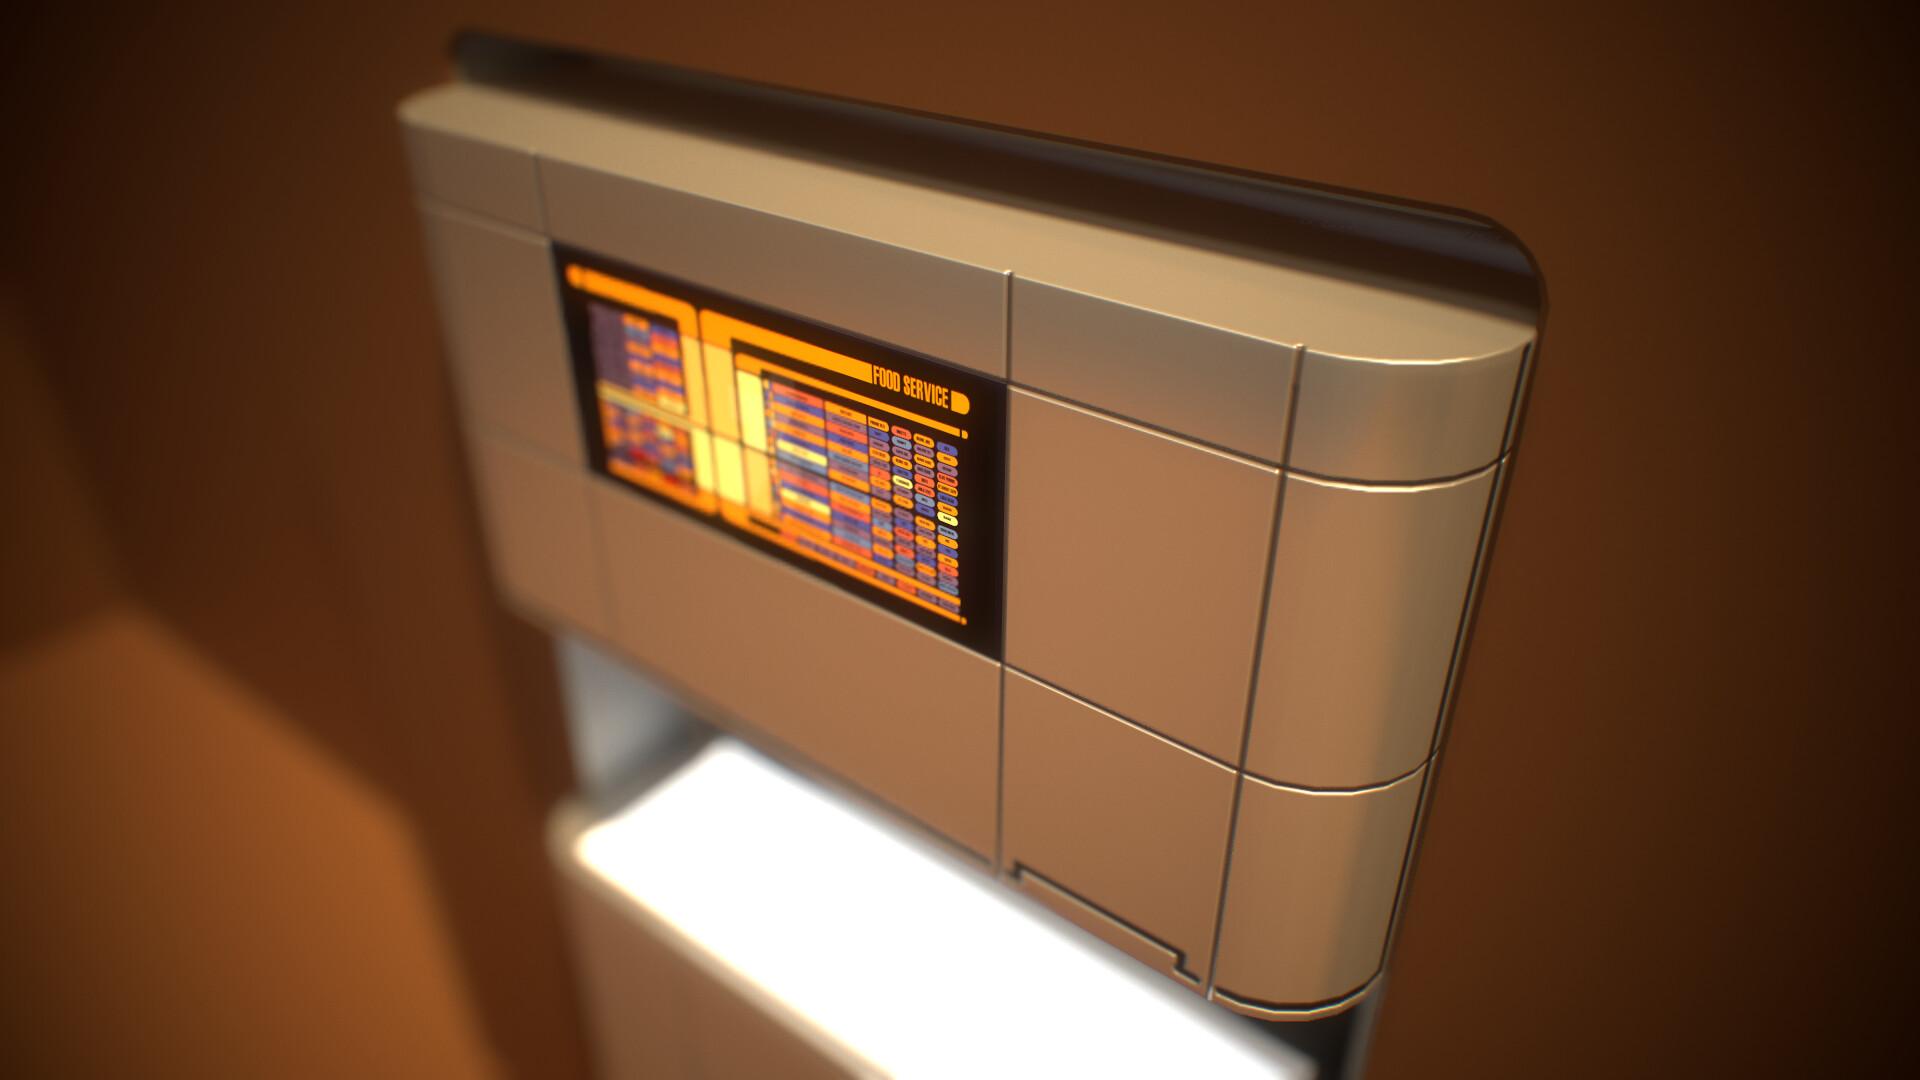 Star Trek Food Replication machine  lowpoly game prop asset Second Life